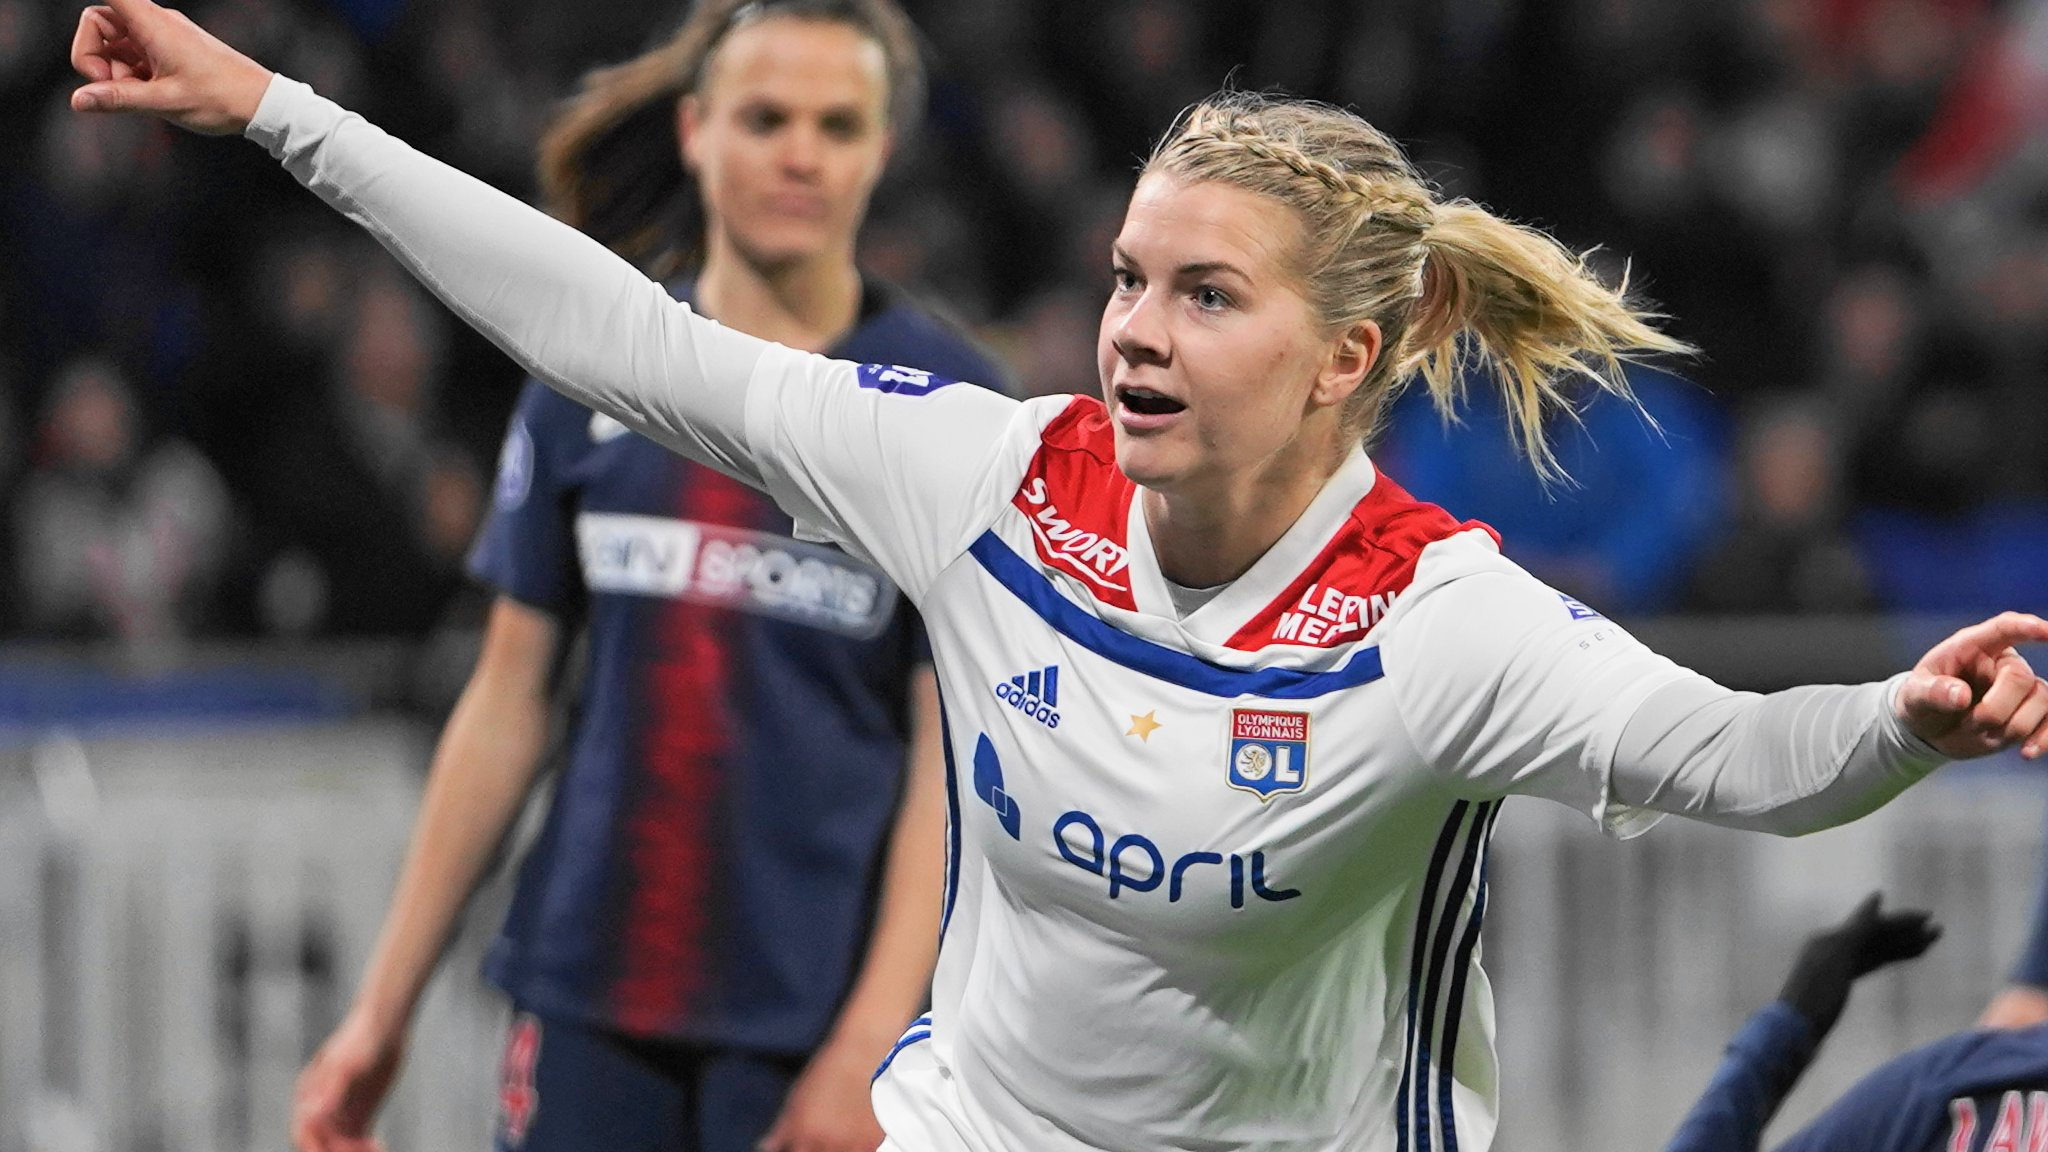 BBC Women's Footballer of the Year 2019: Ada Hegerberg profile